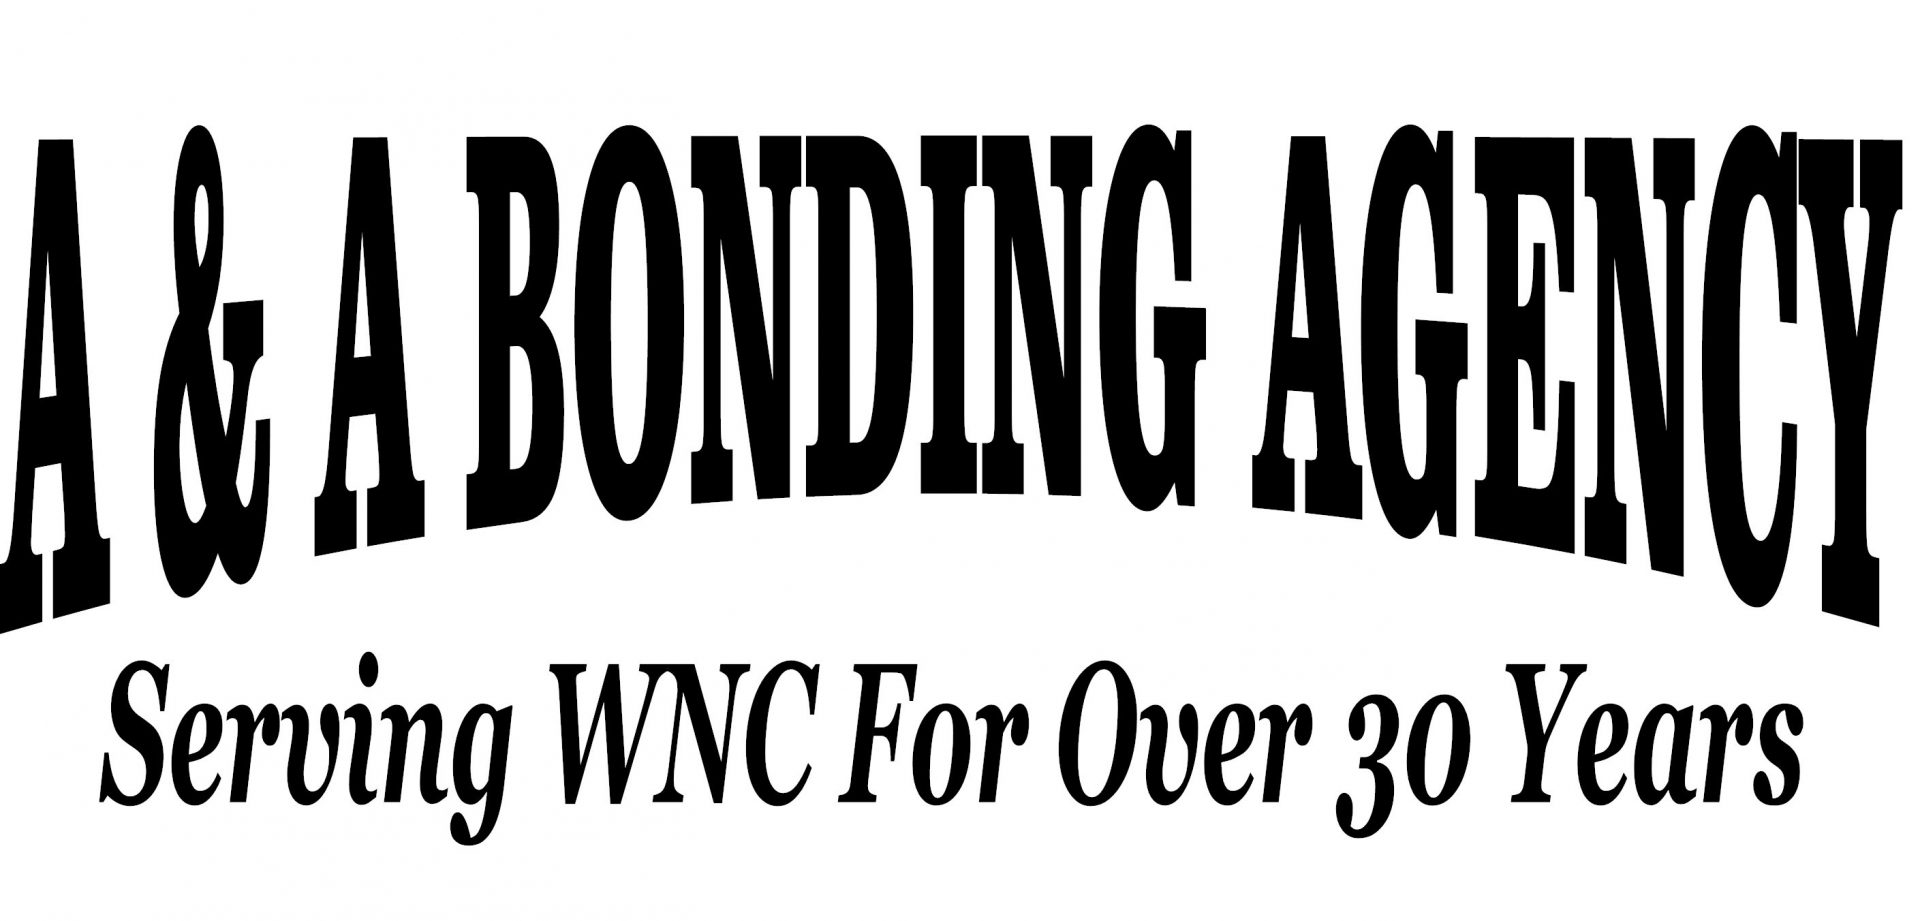 AA BONDING (WALL RESIZED)